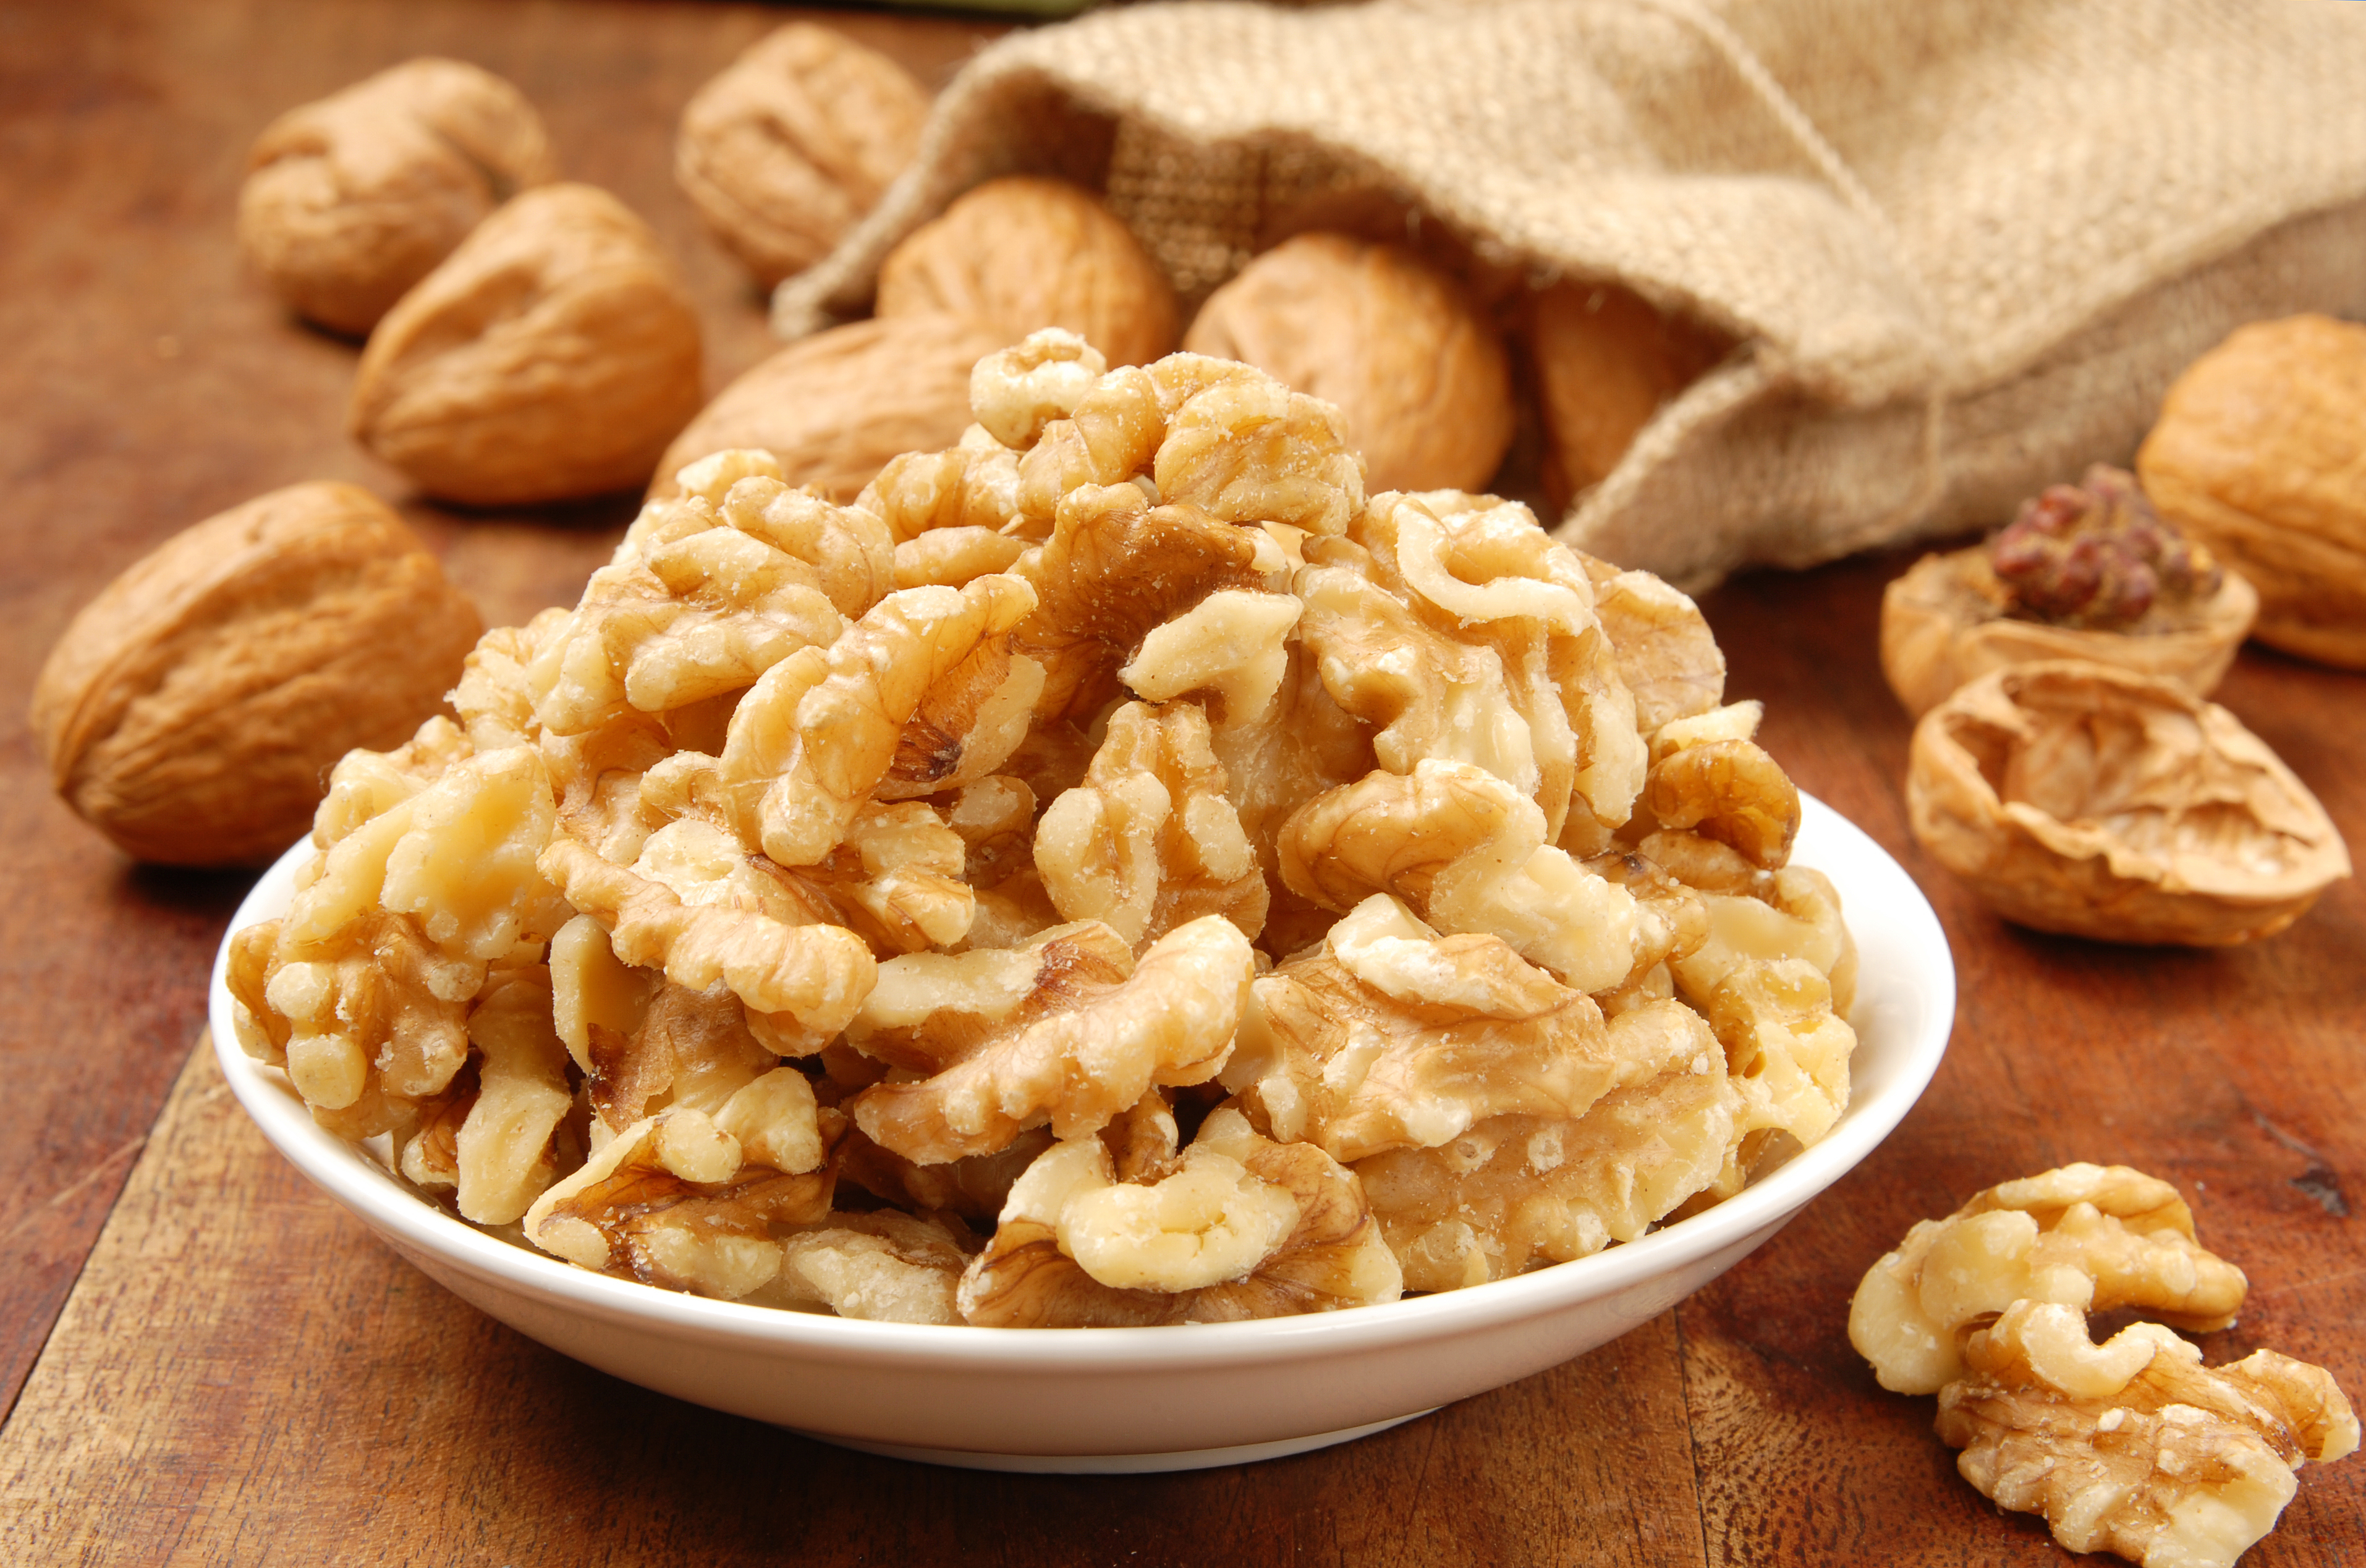 Walnut Protein ELISA Kit